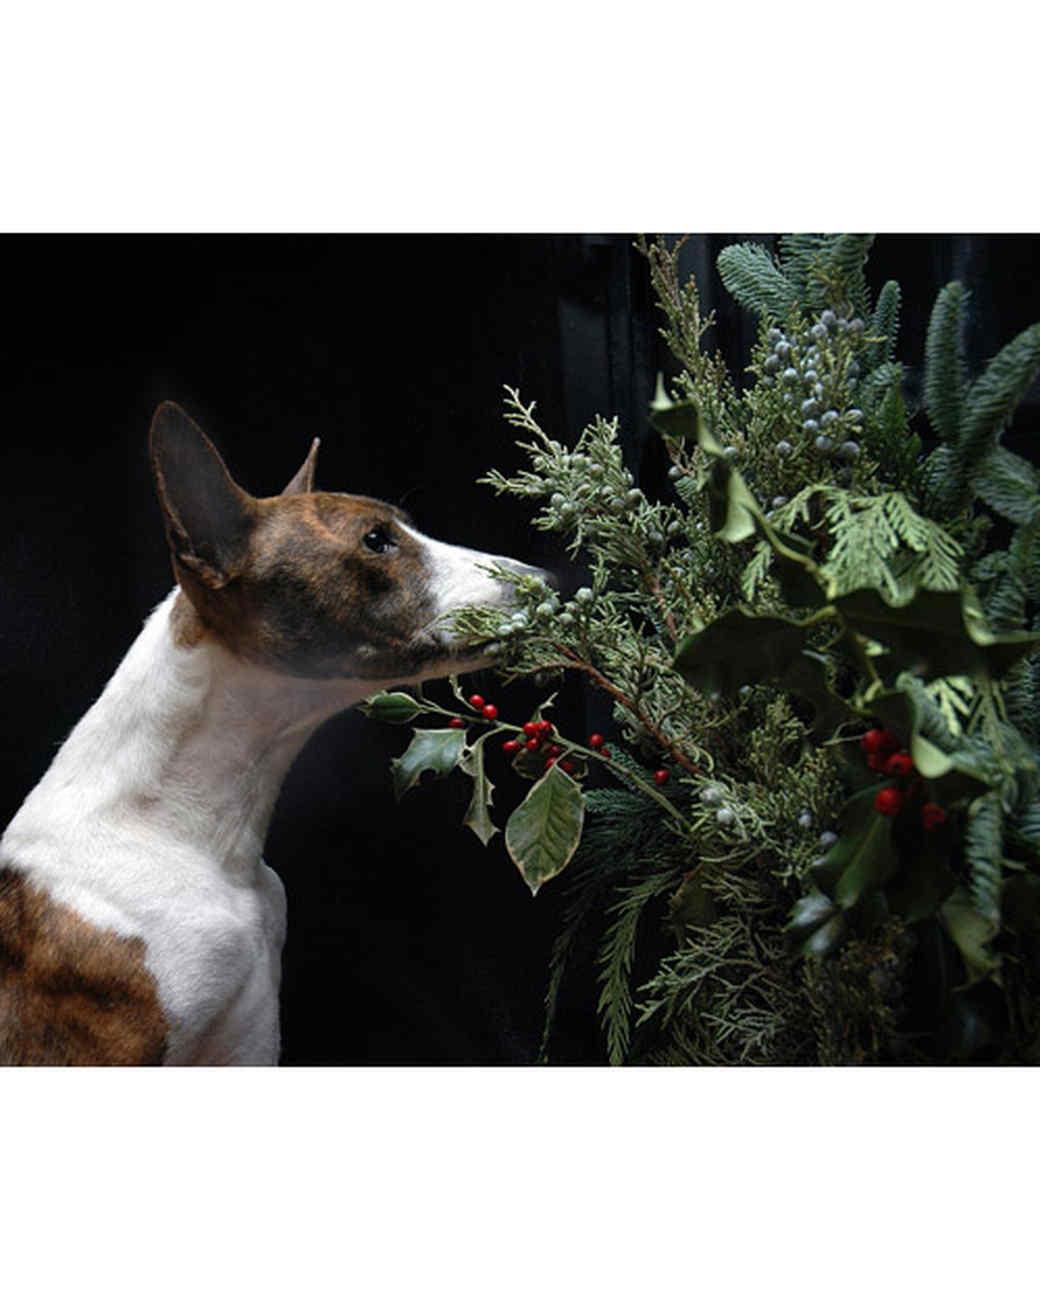 pets_holidaywinner_6983845_18808458.jpg